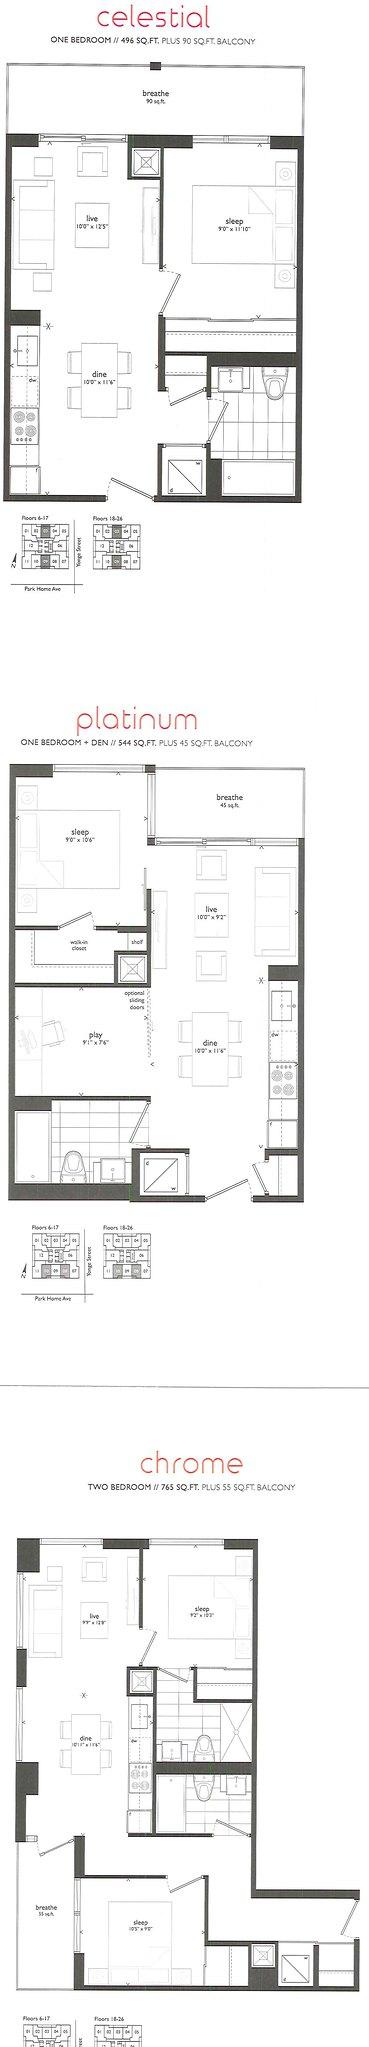 Recommend Floorplan